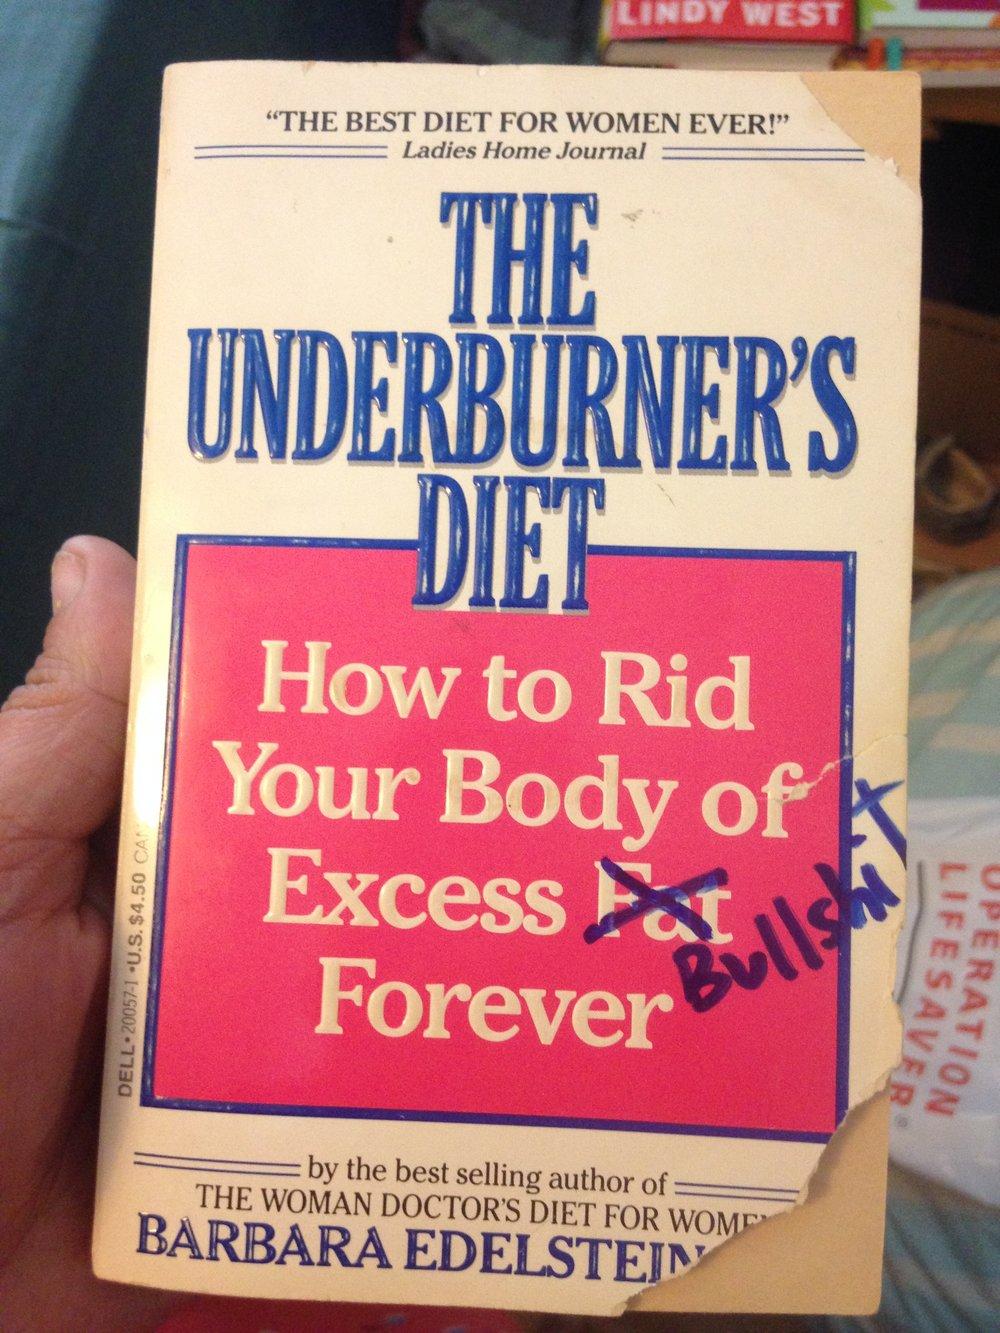 How To Rid Your Body of Excess Bullshit Forever